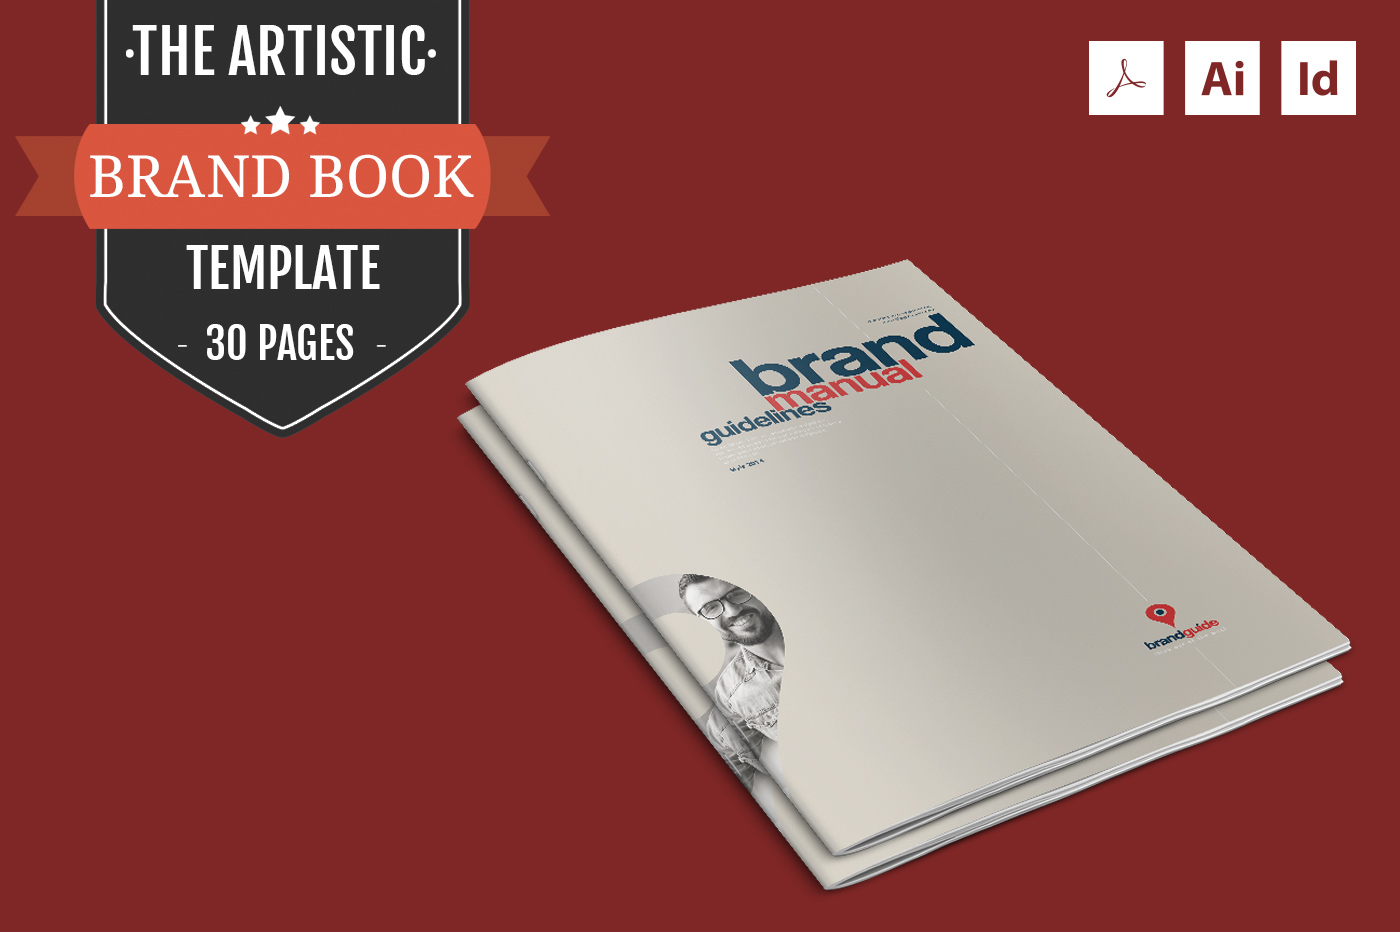 the artistic brand book template brochure templates on creative market. Black Bedroom Furniture Sets. Home Design Ideas